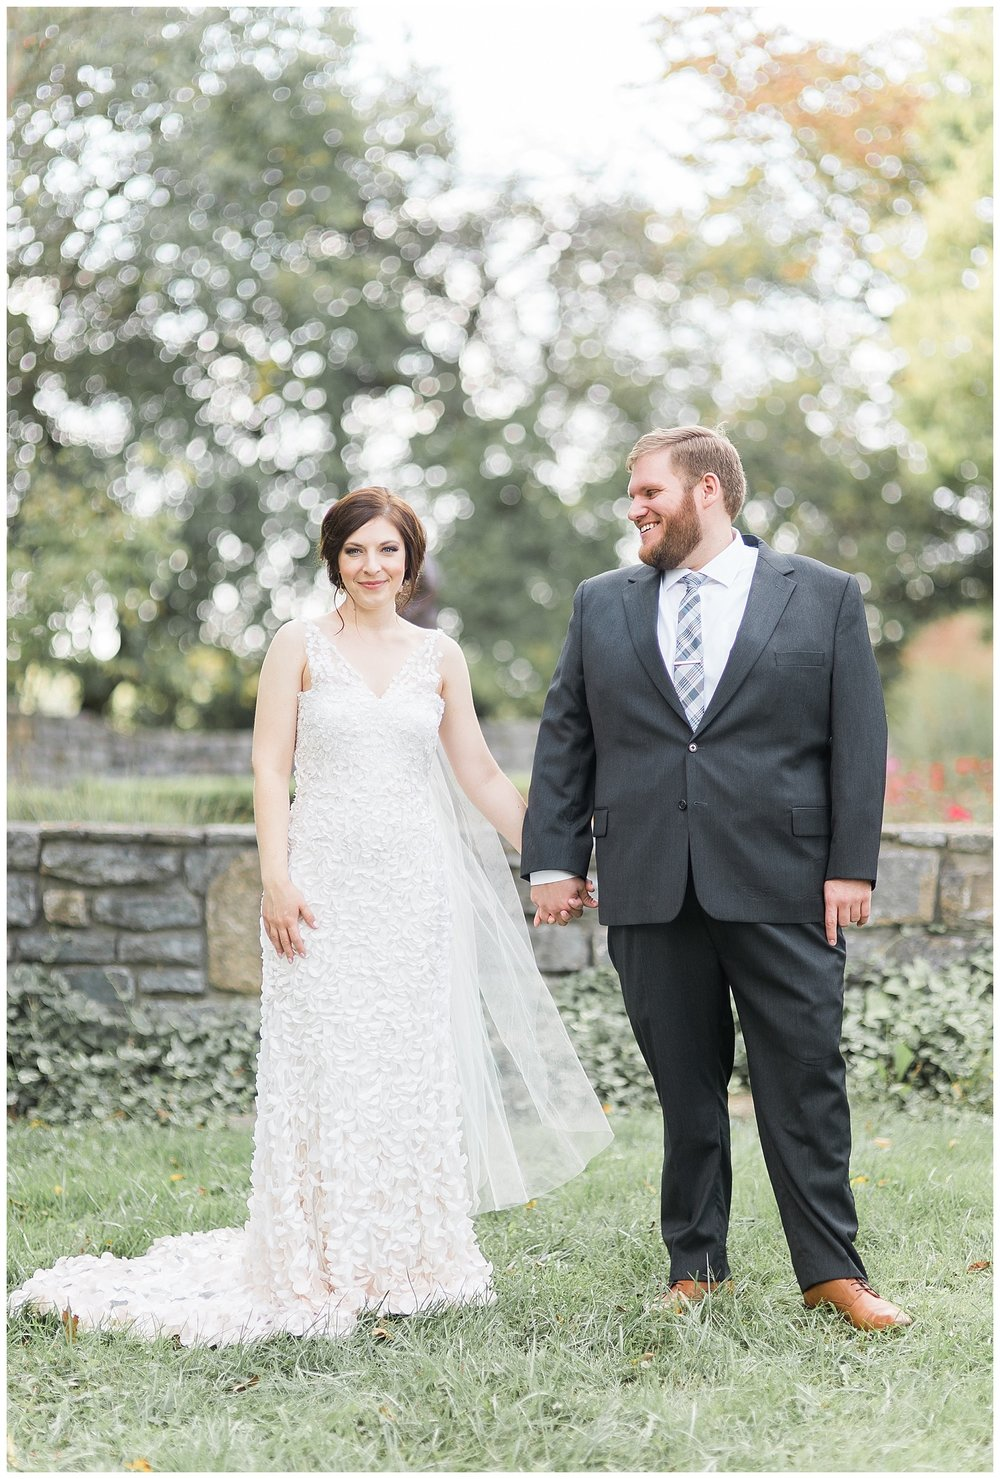 everleigh-photography-pyramid-hill-sculpture-park-cincinnati-wedding-photographer-the-faller-wedding-19